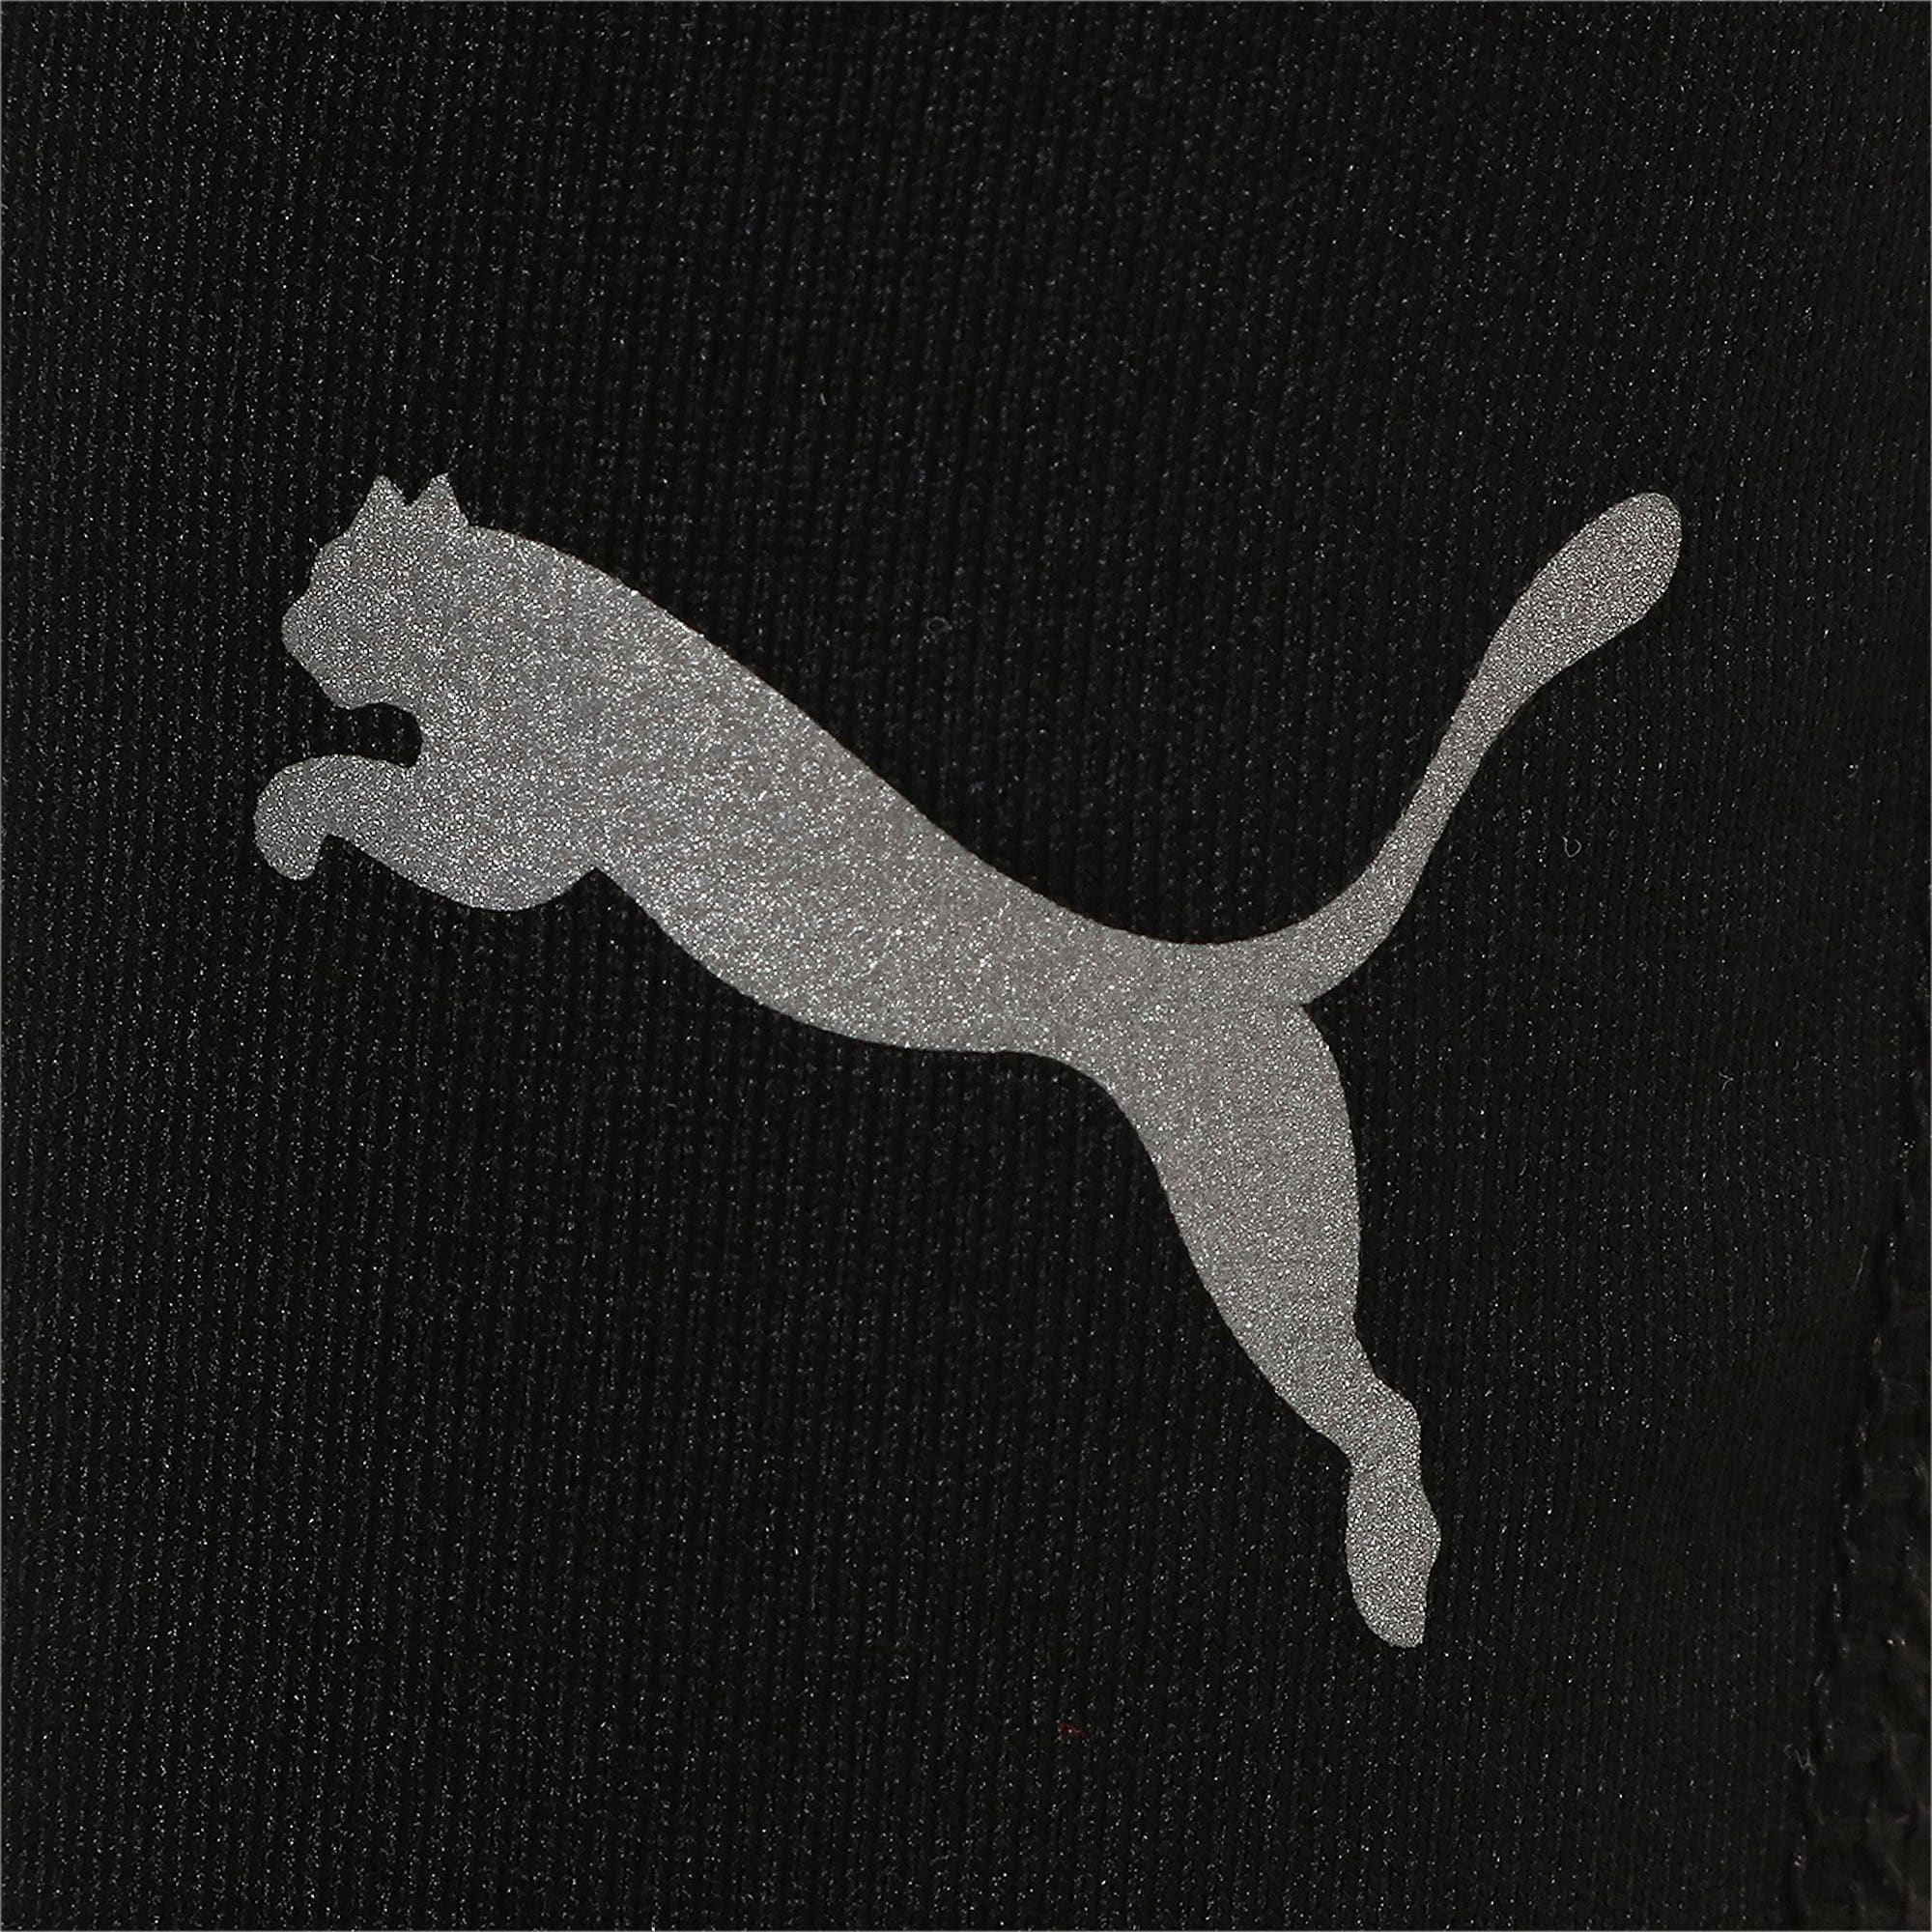 Thumbnail 4 of テック ライト ウィメンズ トレーニング ロングタイツ, Puma Black, medium-JPN